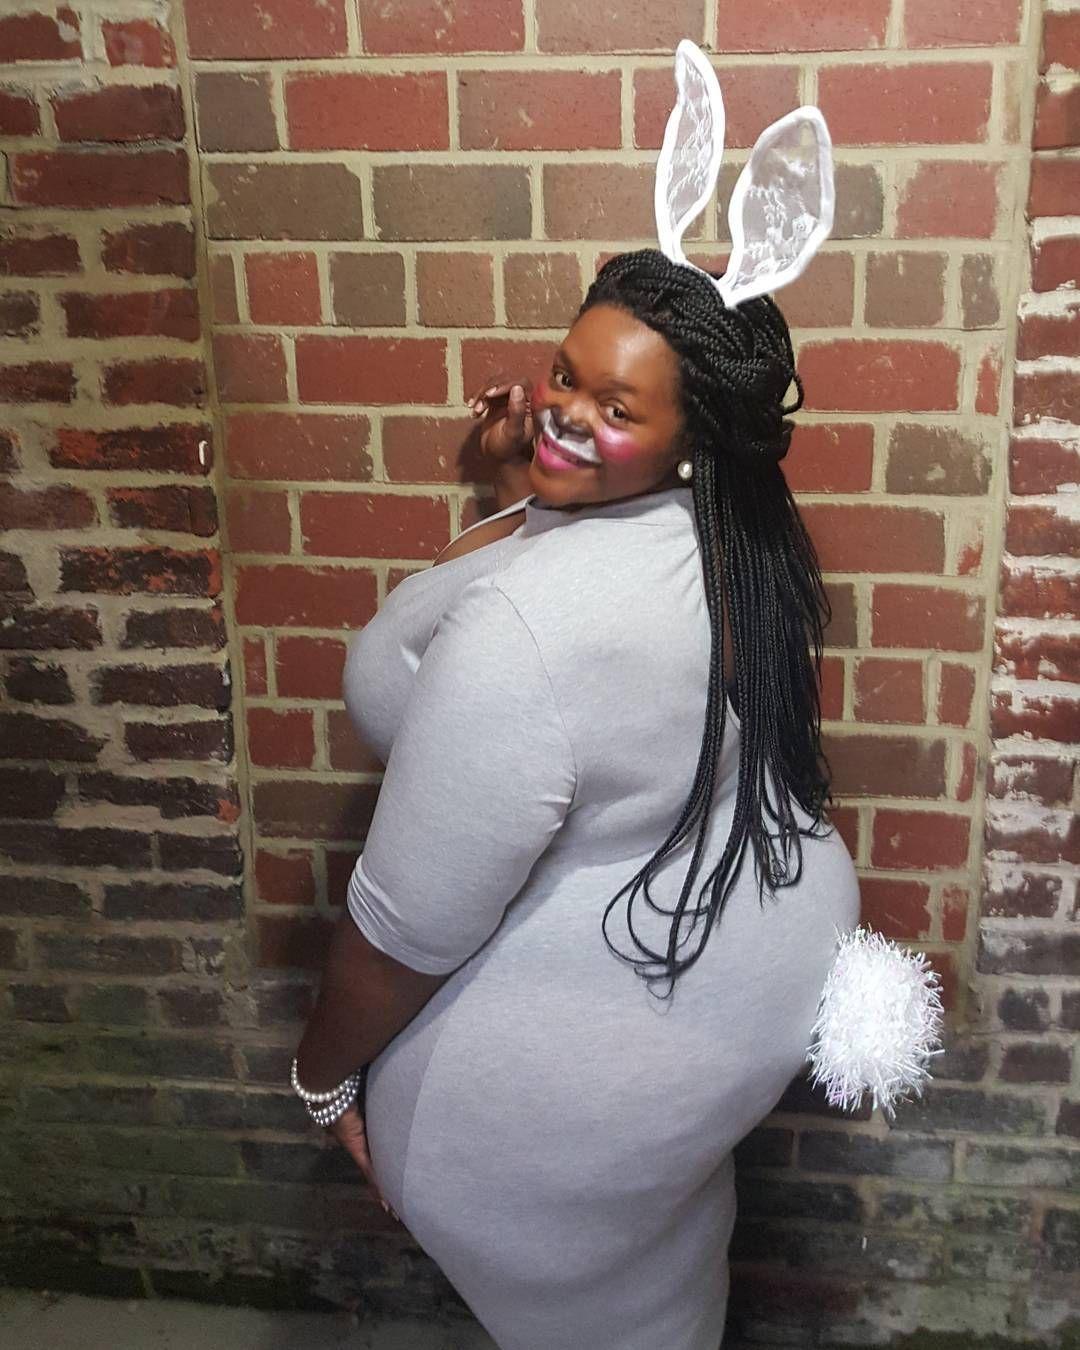 Bbw best bunny girl